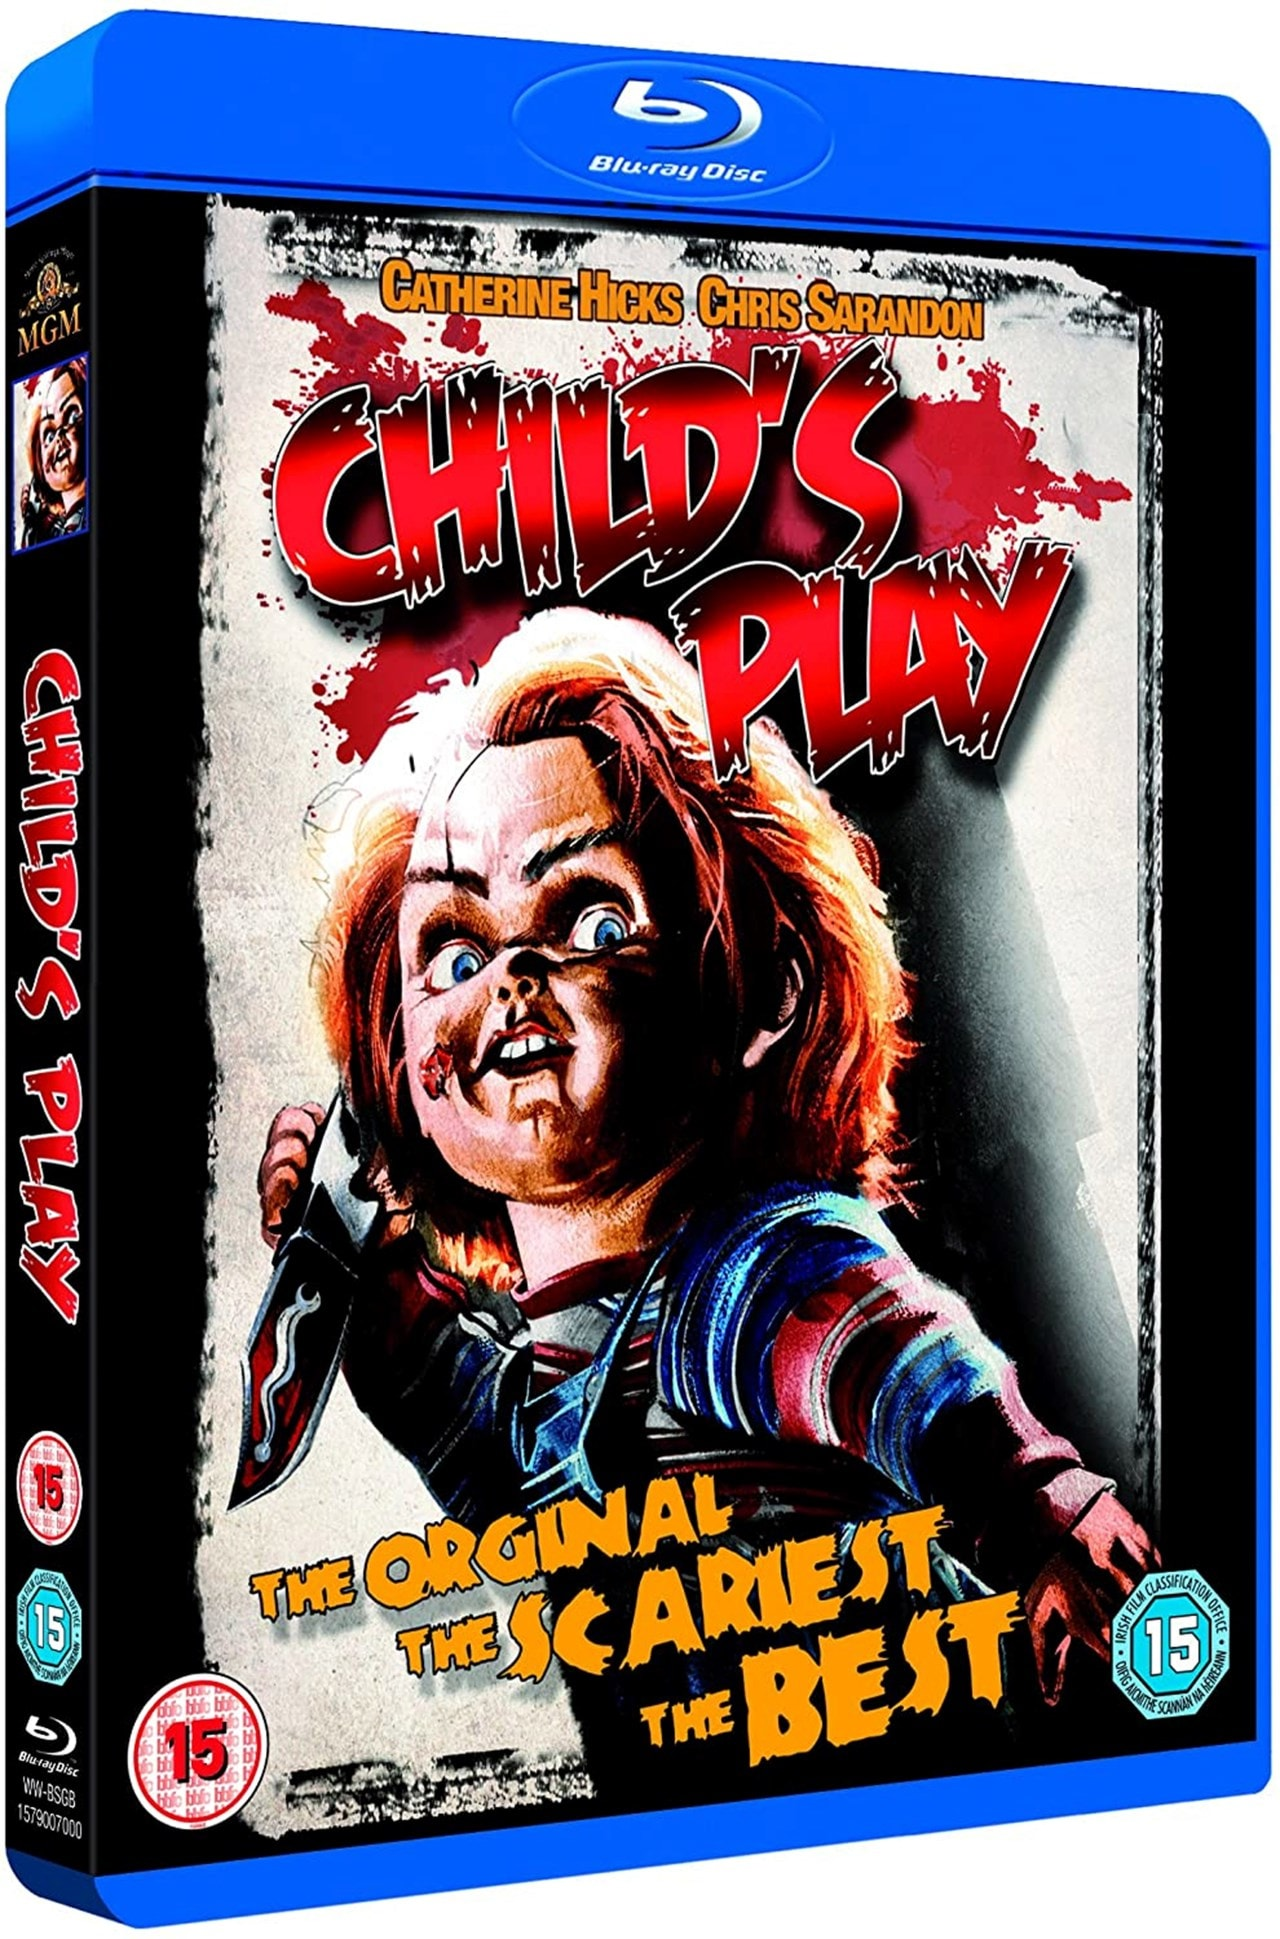 Child's Play - 3